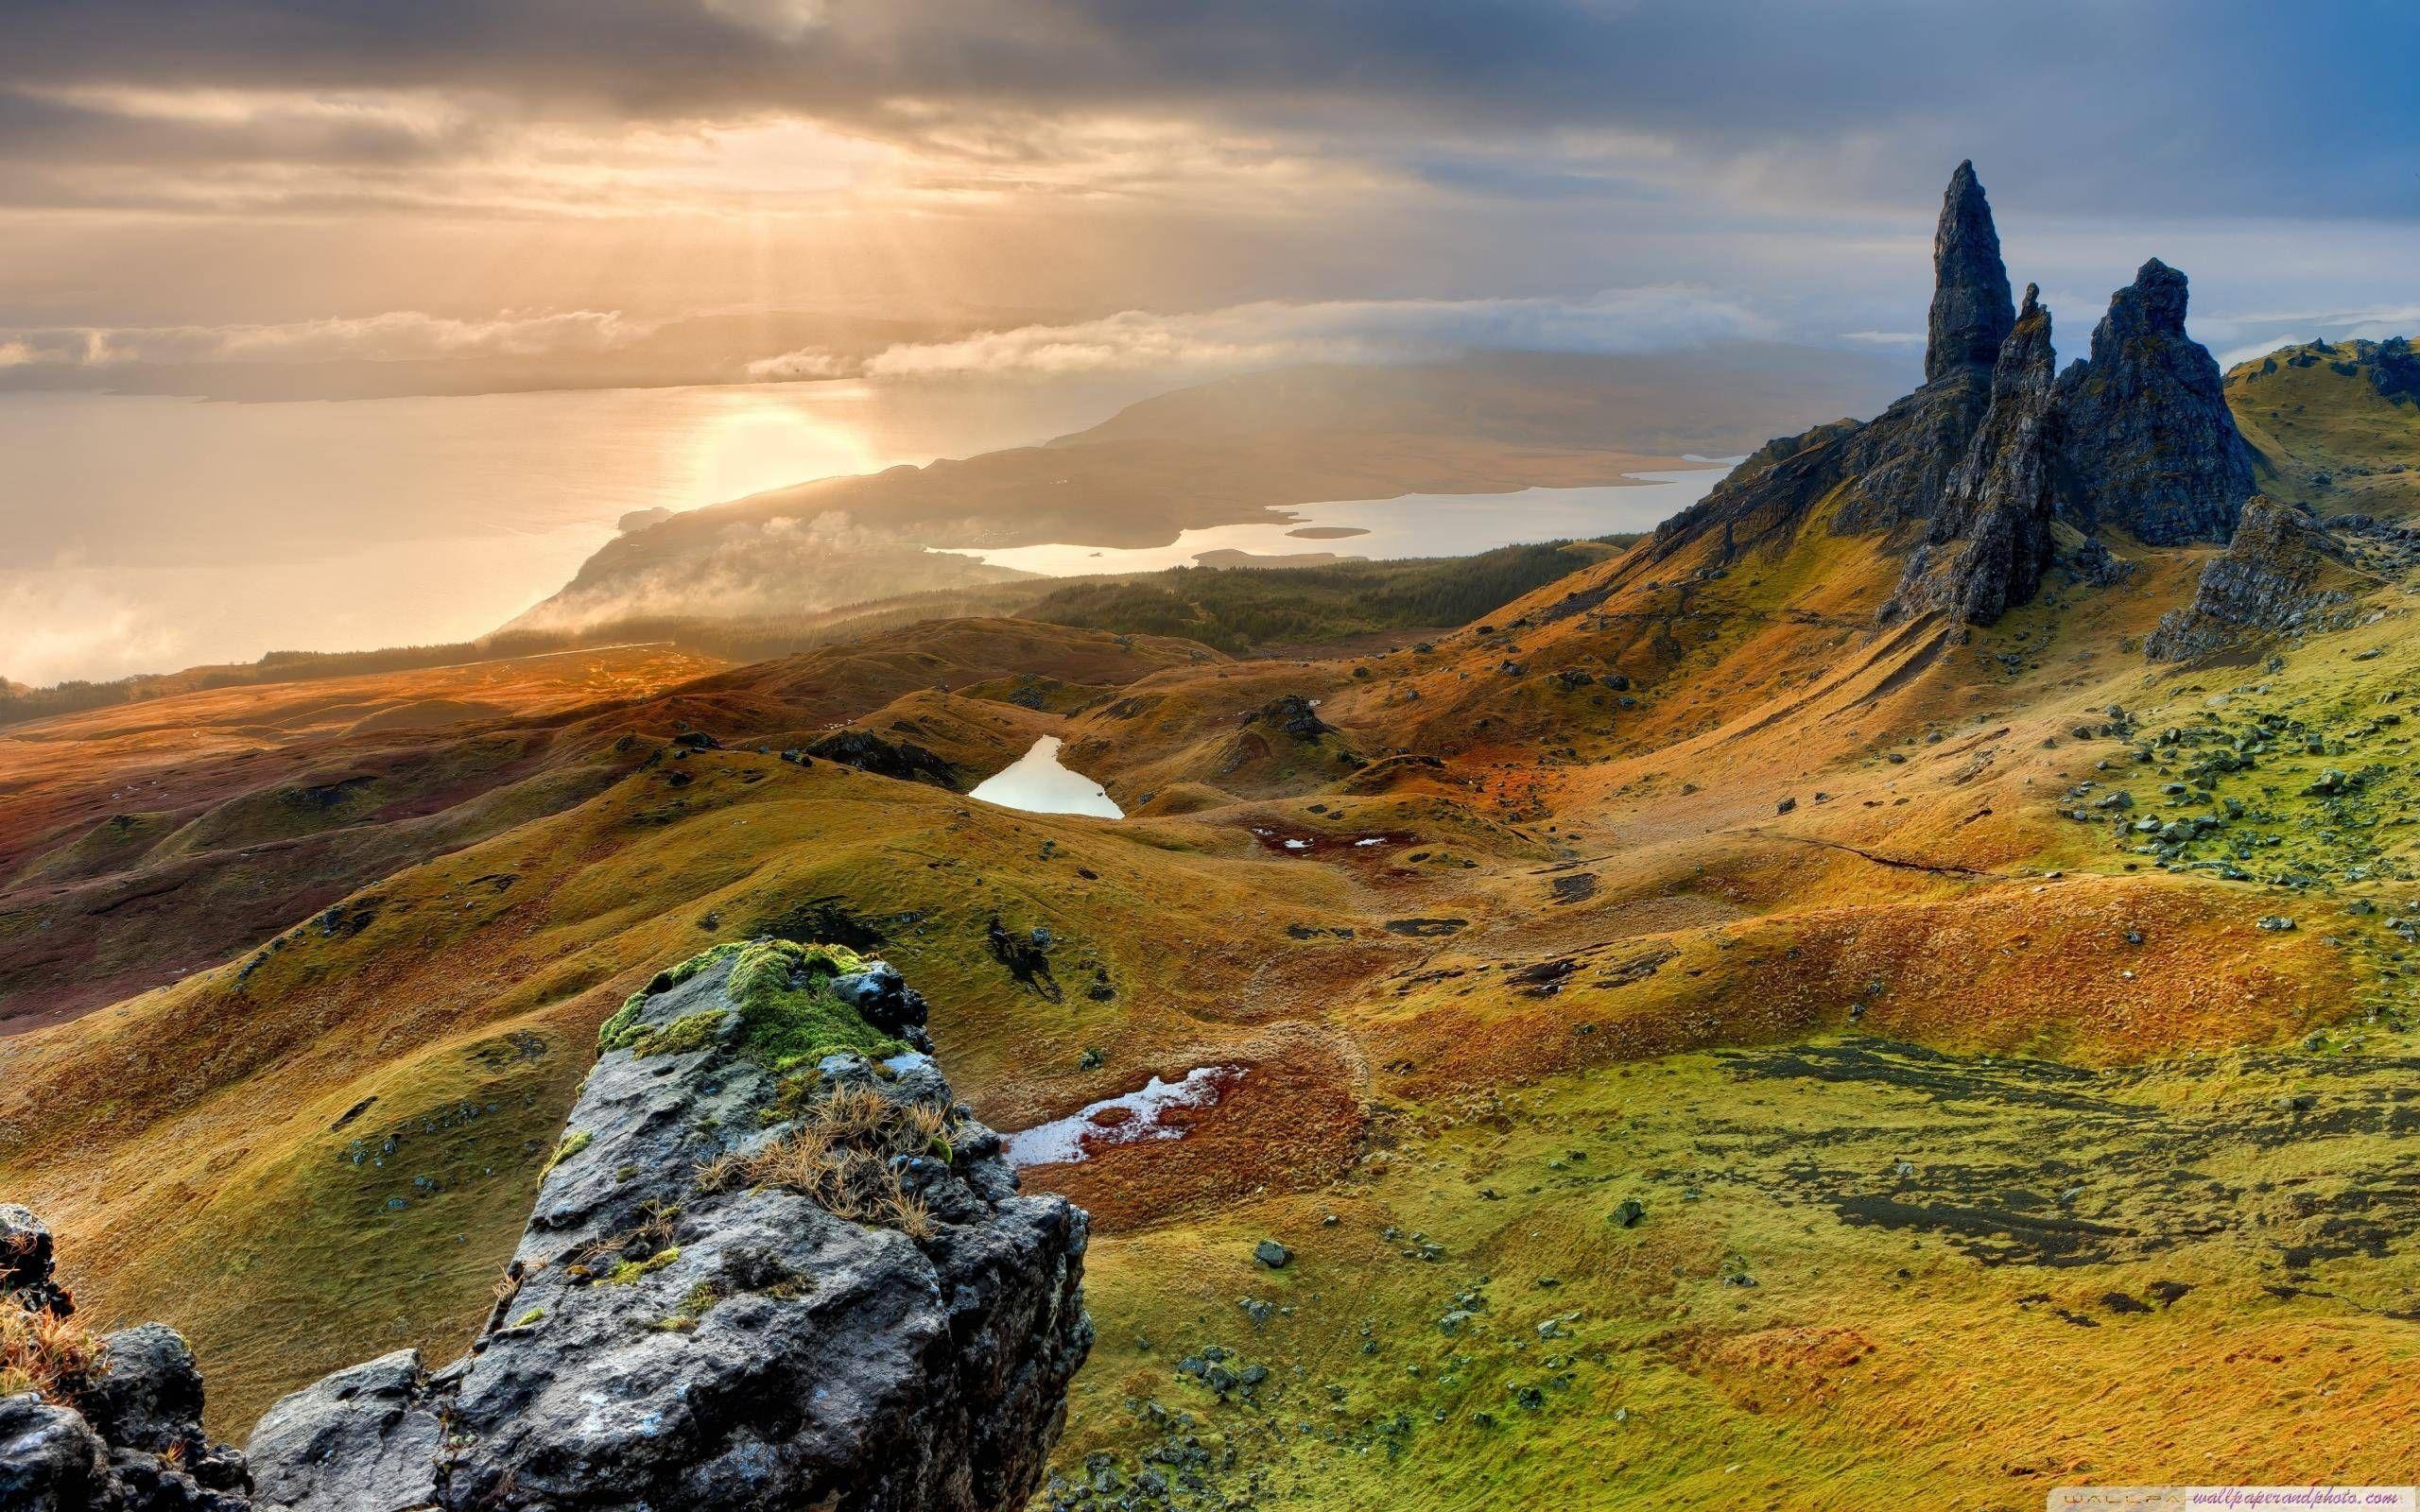 Quiraing Hill Isle Of Skye Scotland Hd 16 9 16 10 Desktop Wallpaper Widescreen Scotland Wallpaper Isle Of Skye Skye Scotland